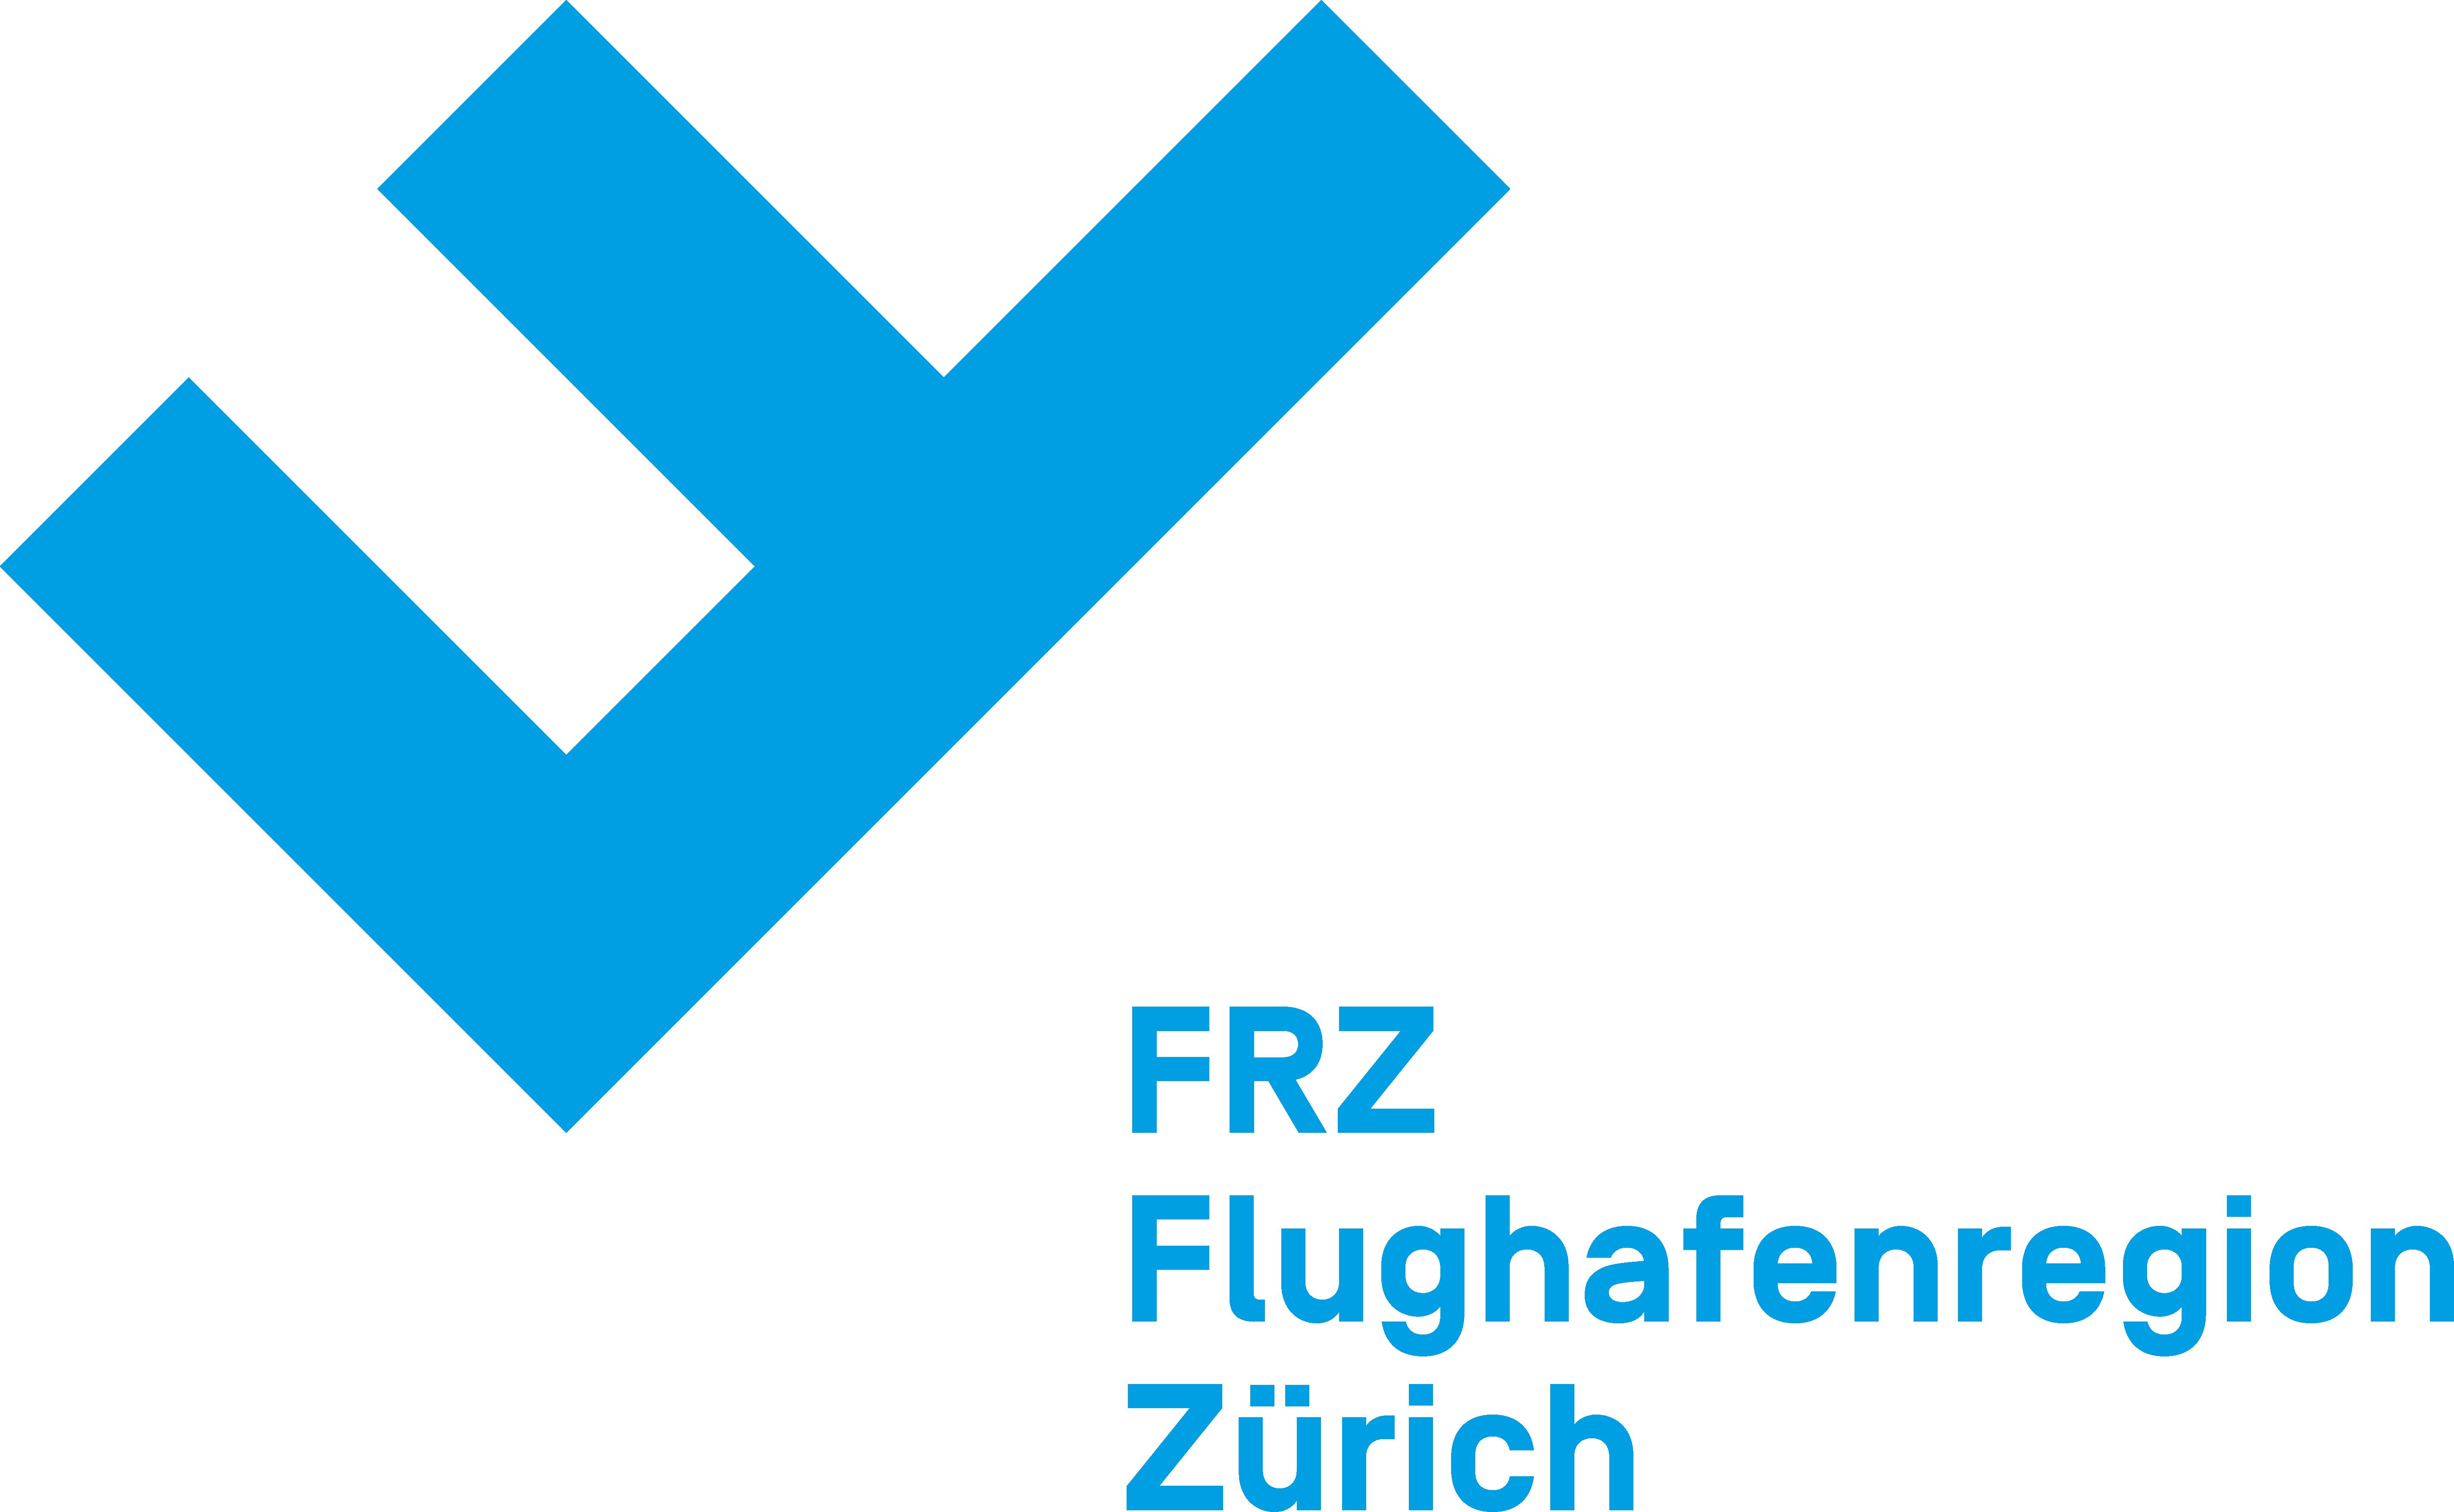 FRZ_Bildmarke+FRZ_Logo_Cyan PNG